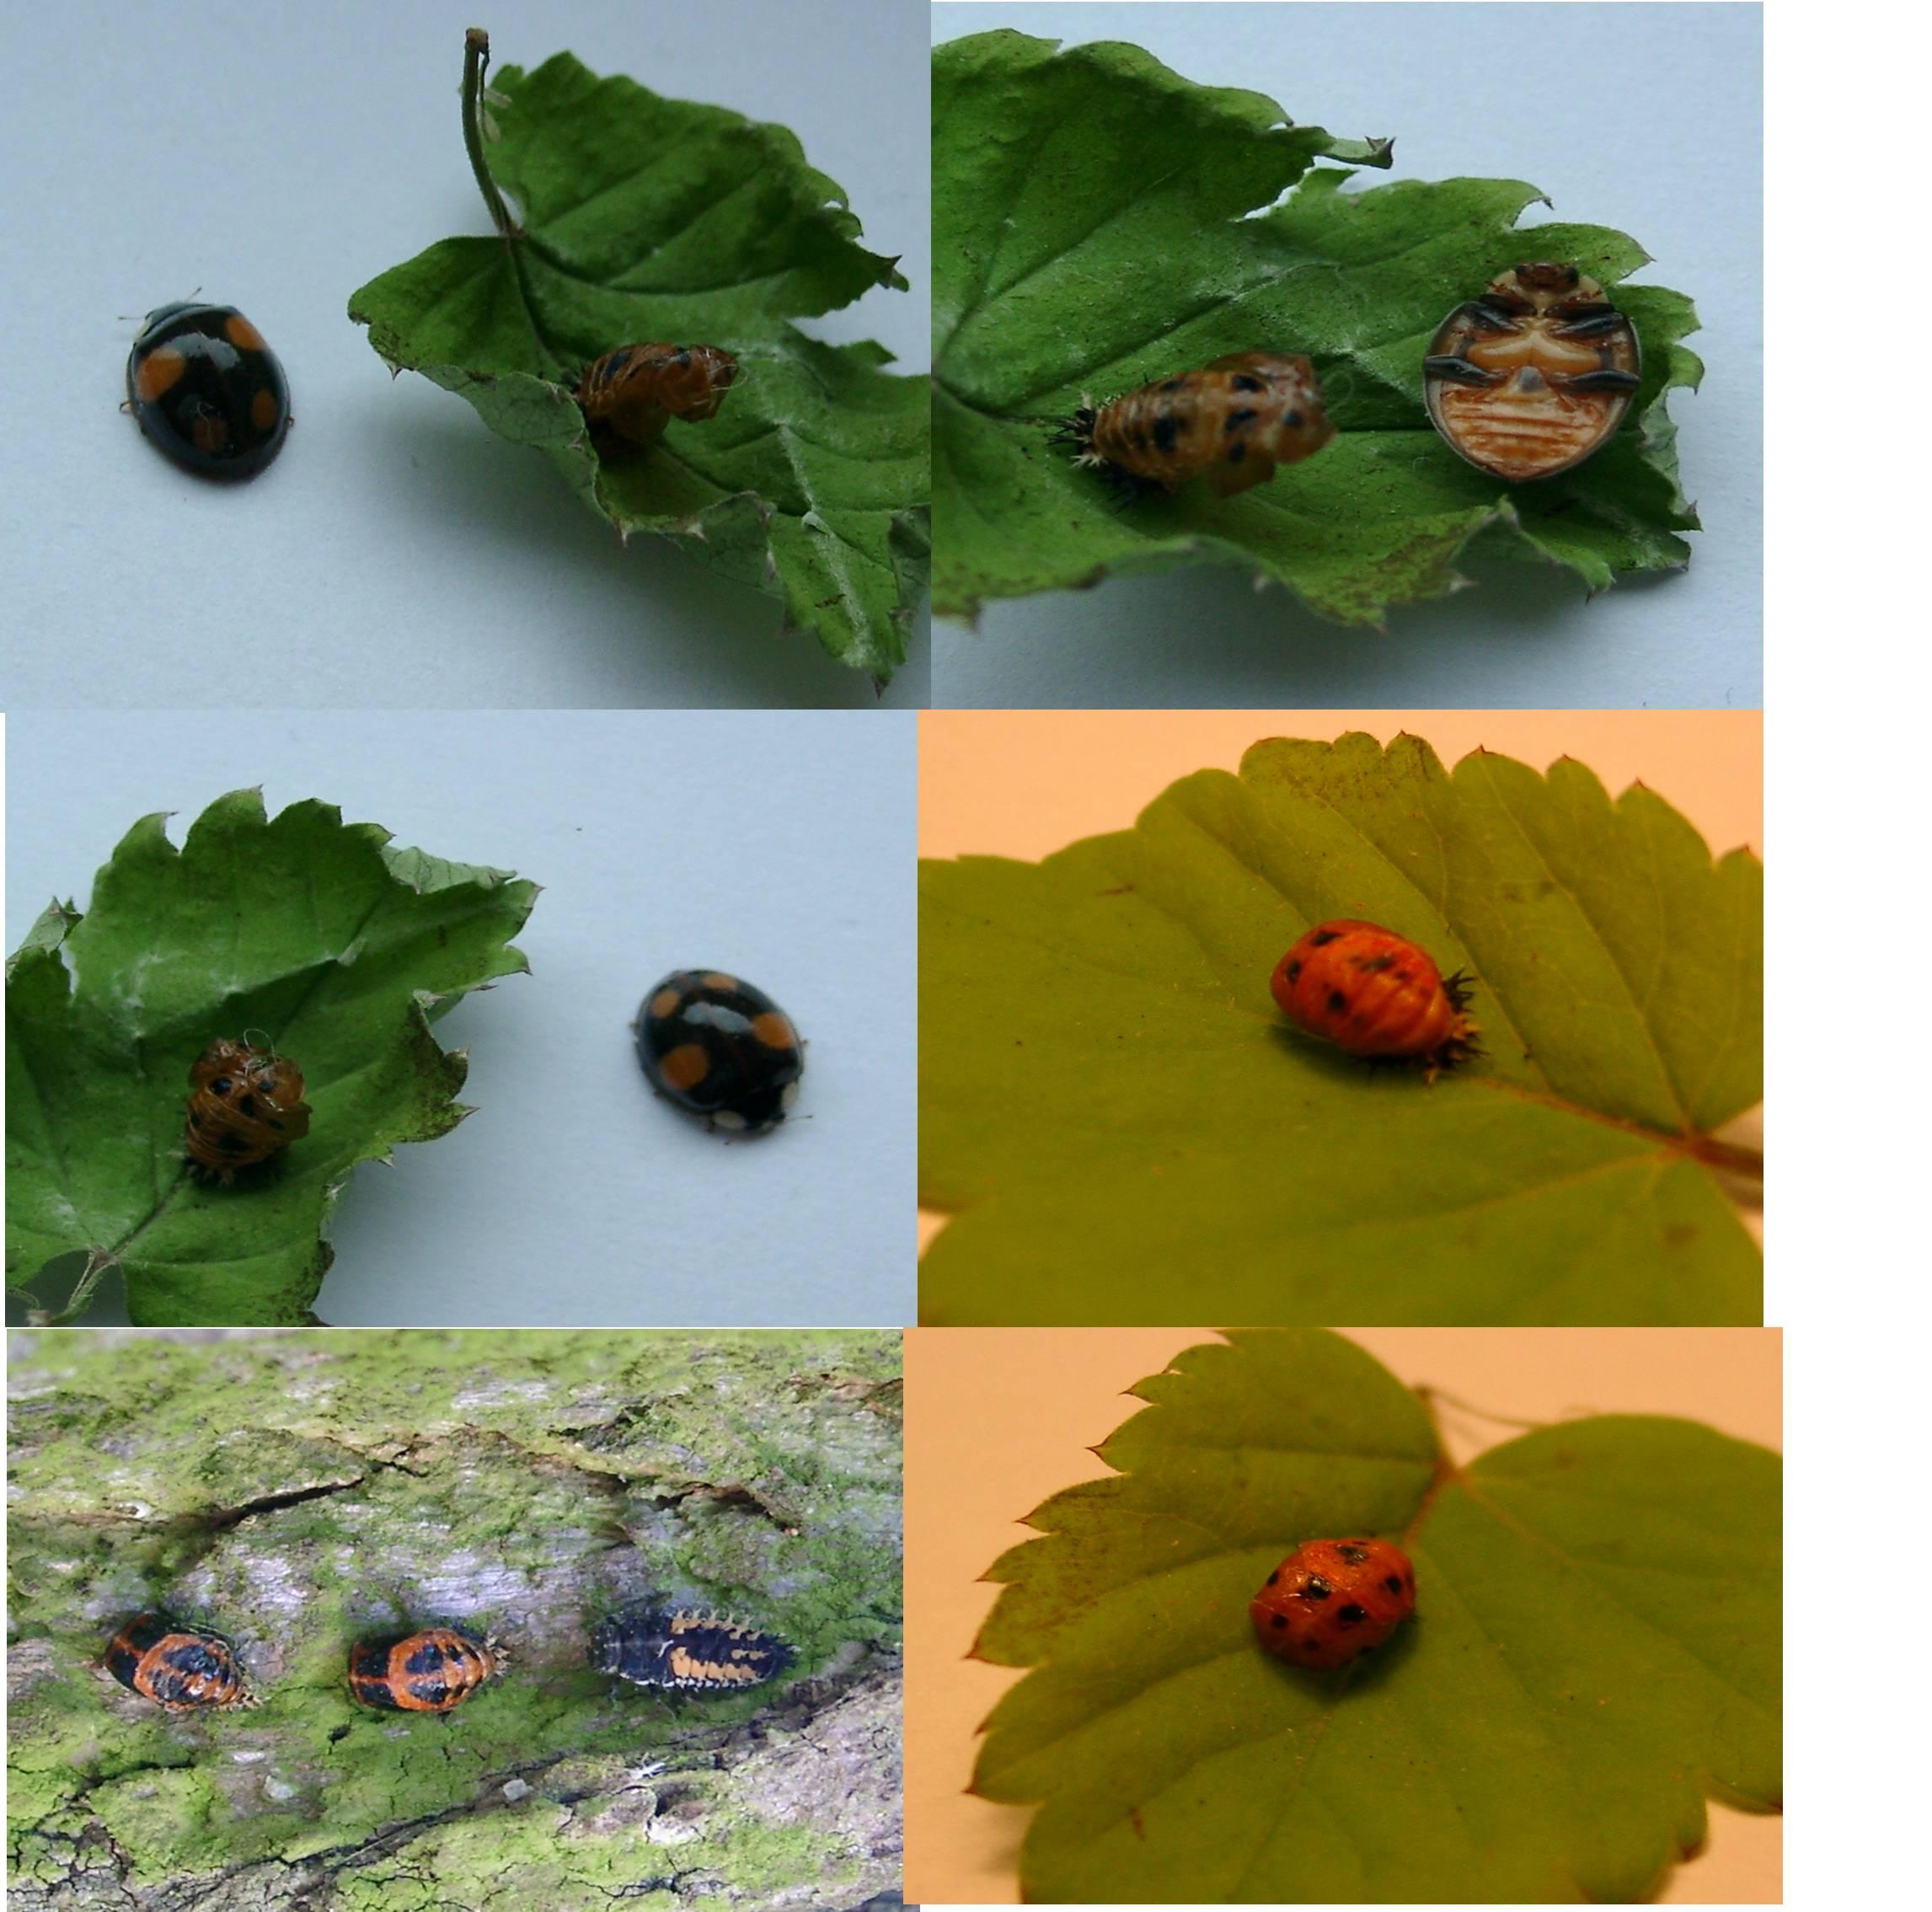 filecoccinellidae developmentjpg wikimedia commons